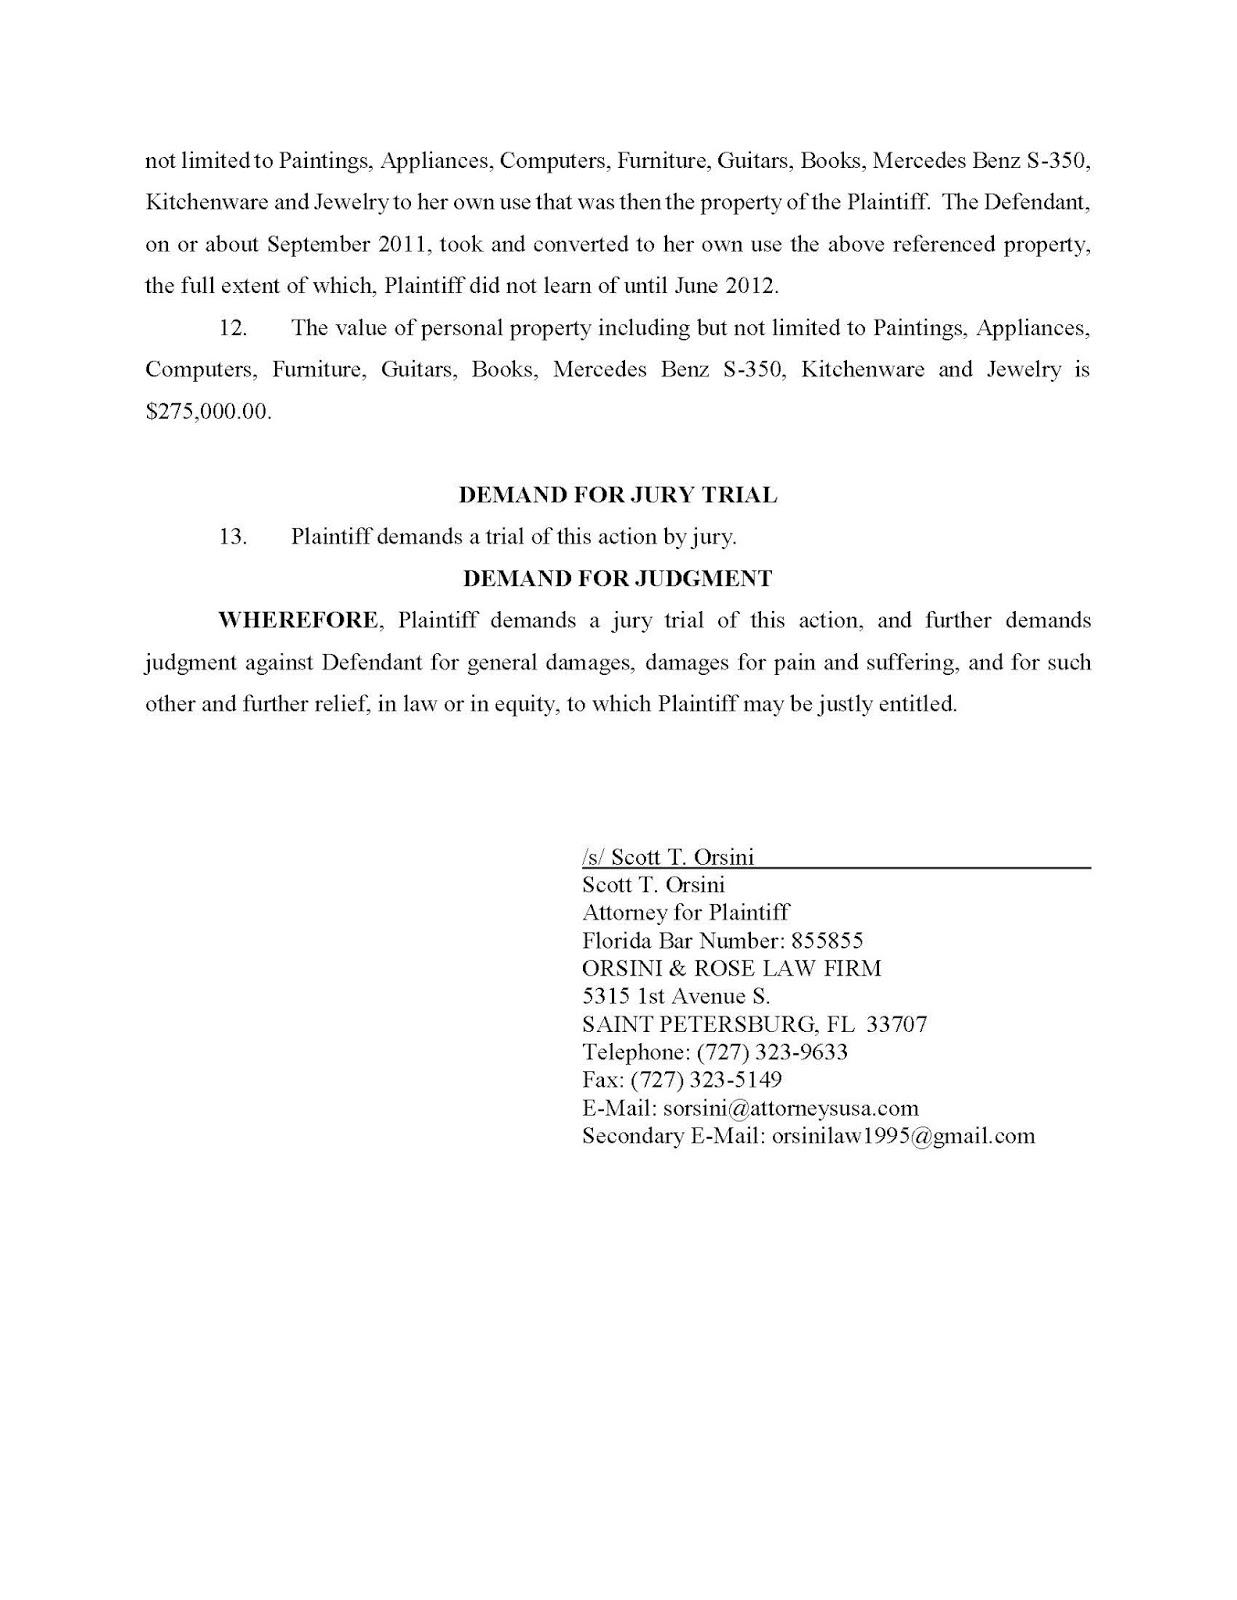 MorganStanleyGate: Theft & Malicious Prosecution Lawsuit